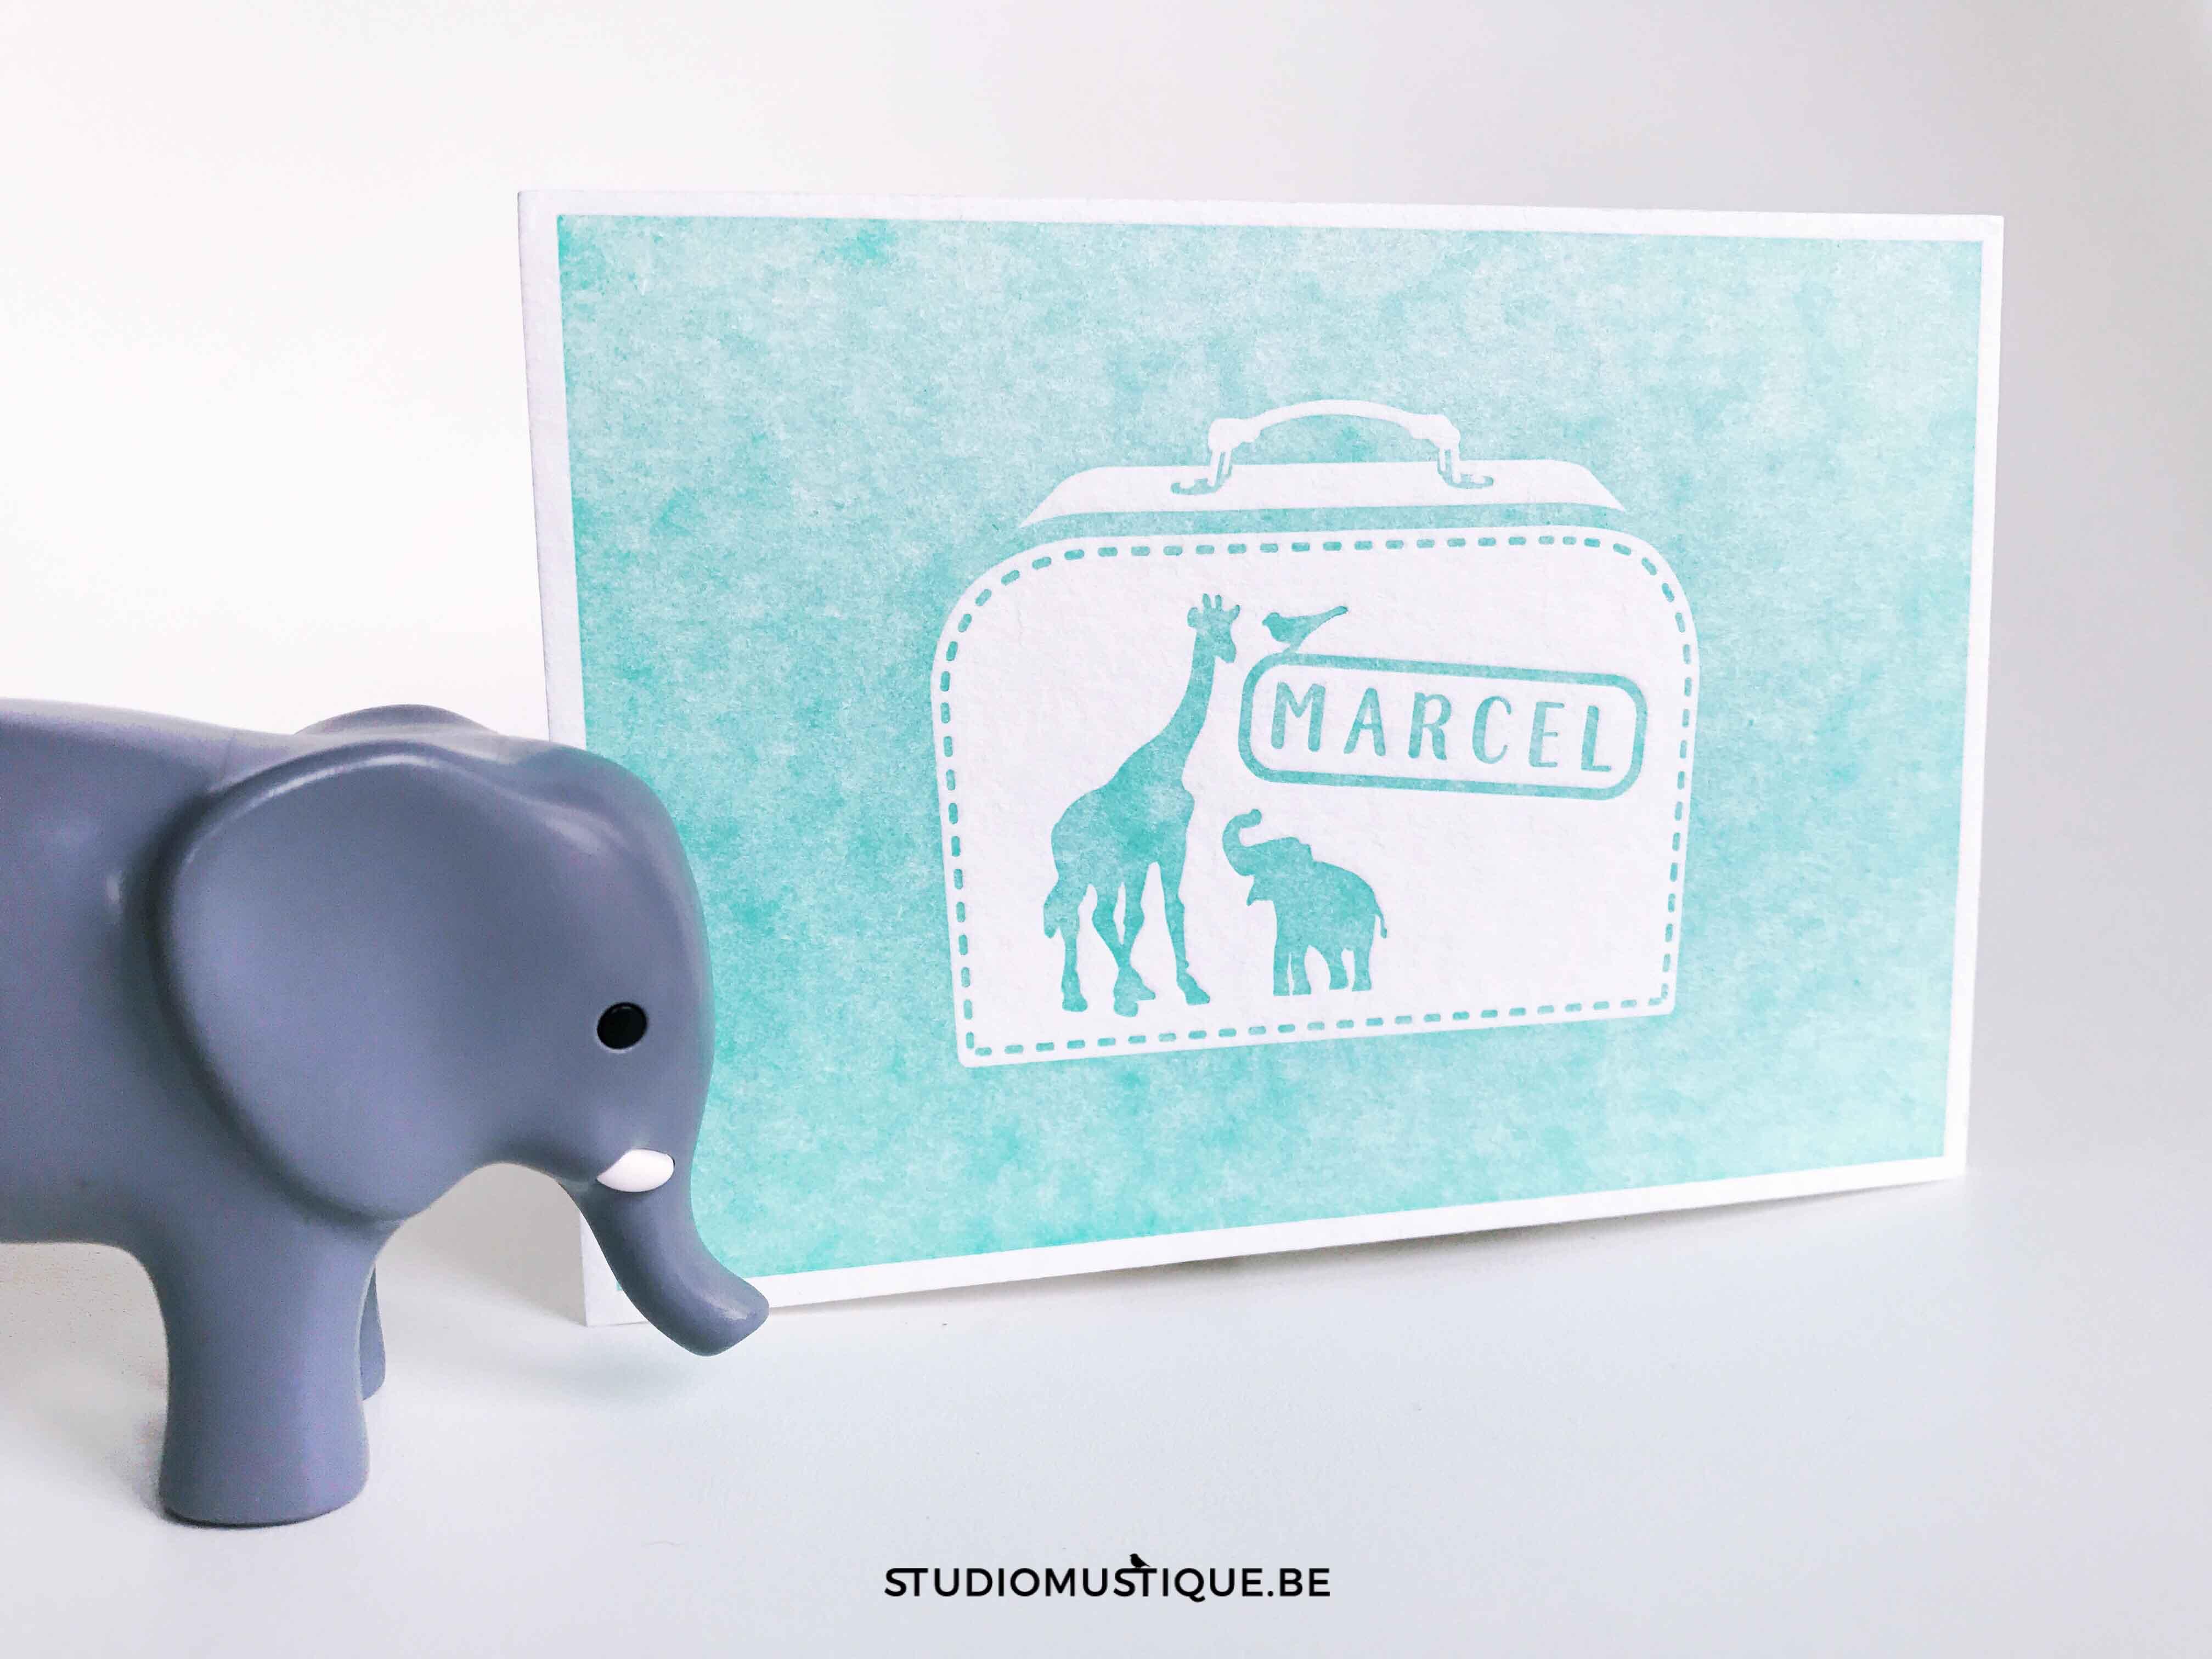 Studio Mustique Adoptiekaartje Marcel koffertje adoptie olifant giraf zebra valies letterpress munt